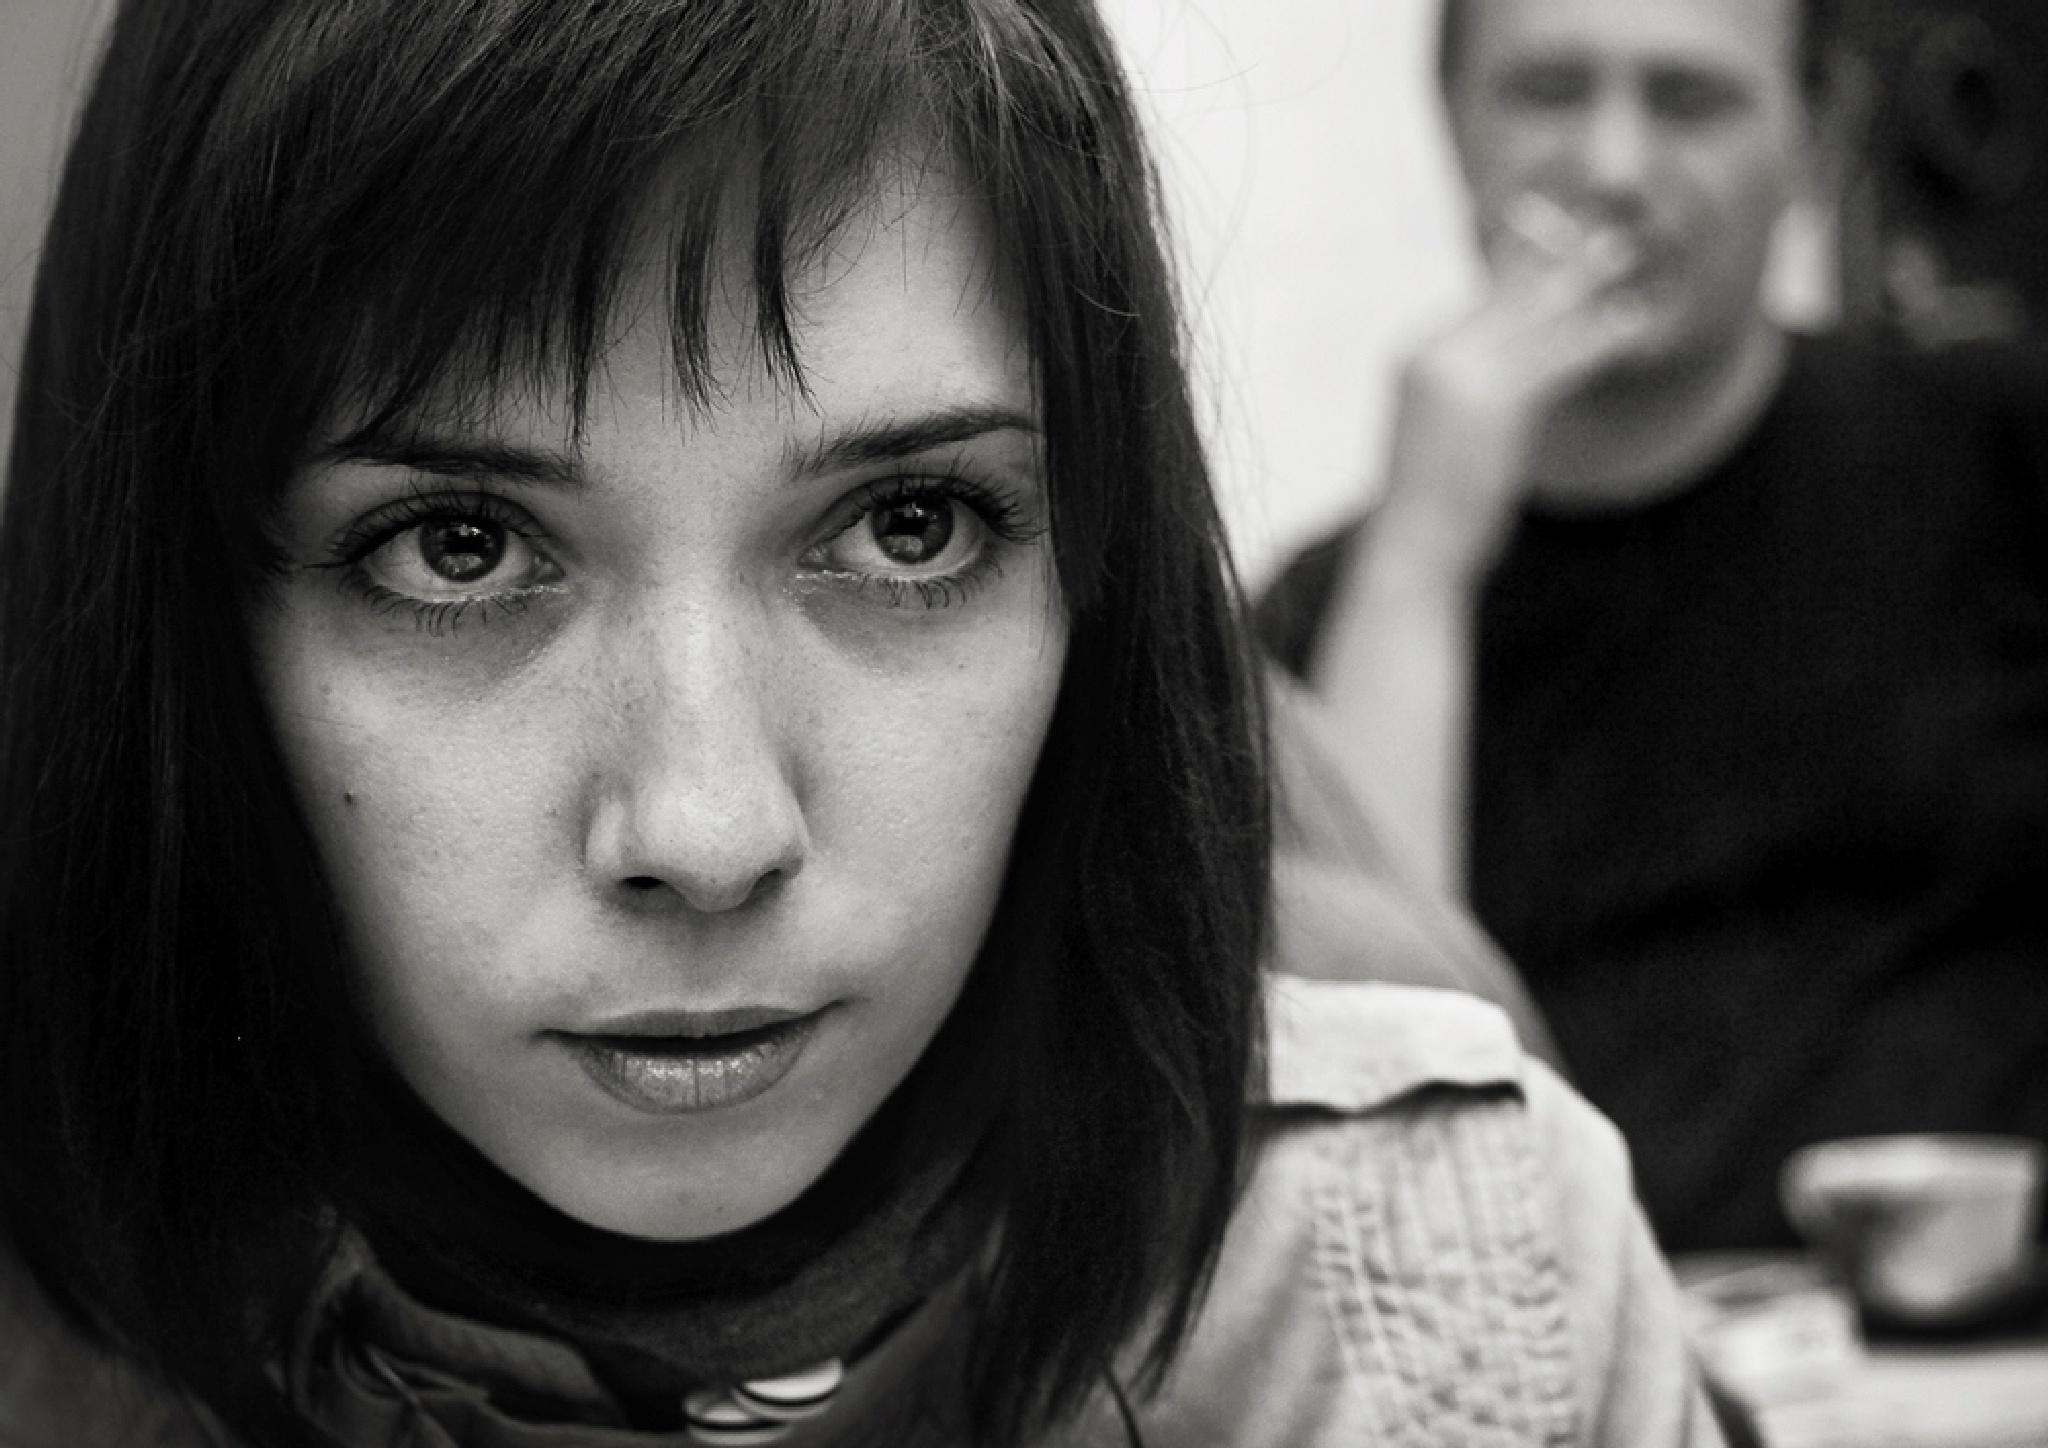 Under control by Сергей Юрьев